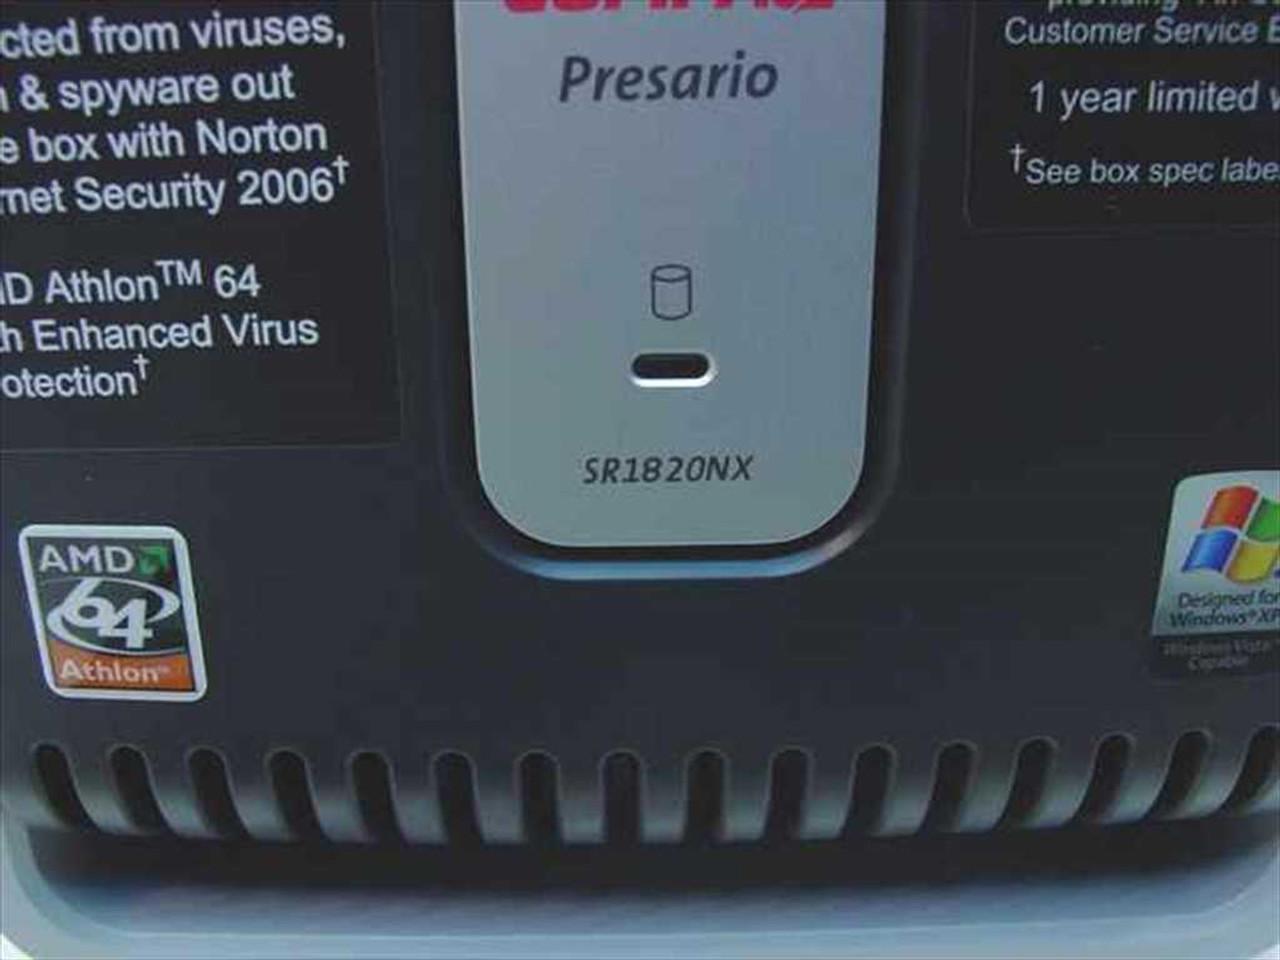 COMPAQ PRESARIO SR1820NX AUDIO DRIVER PC